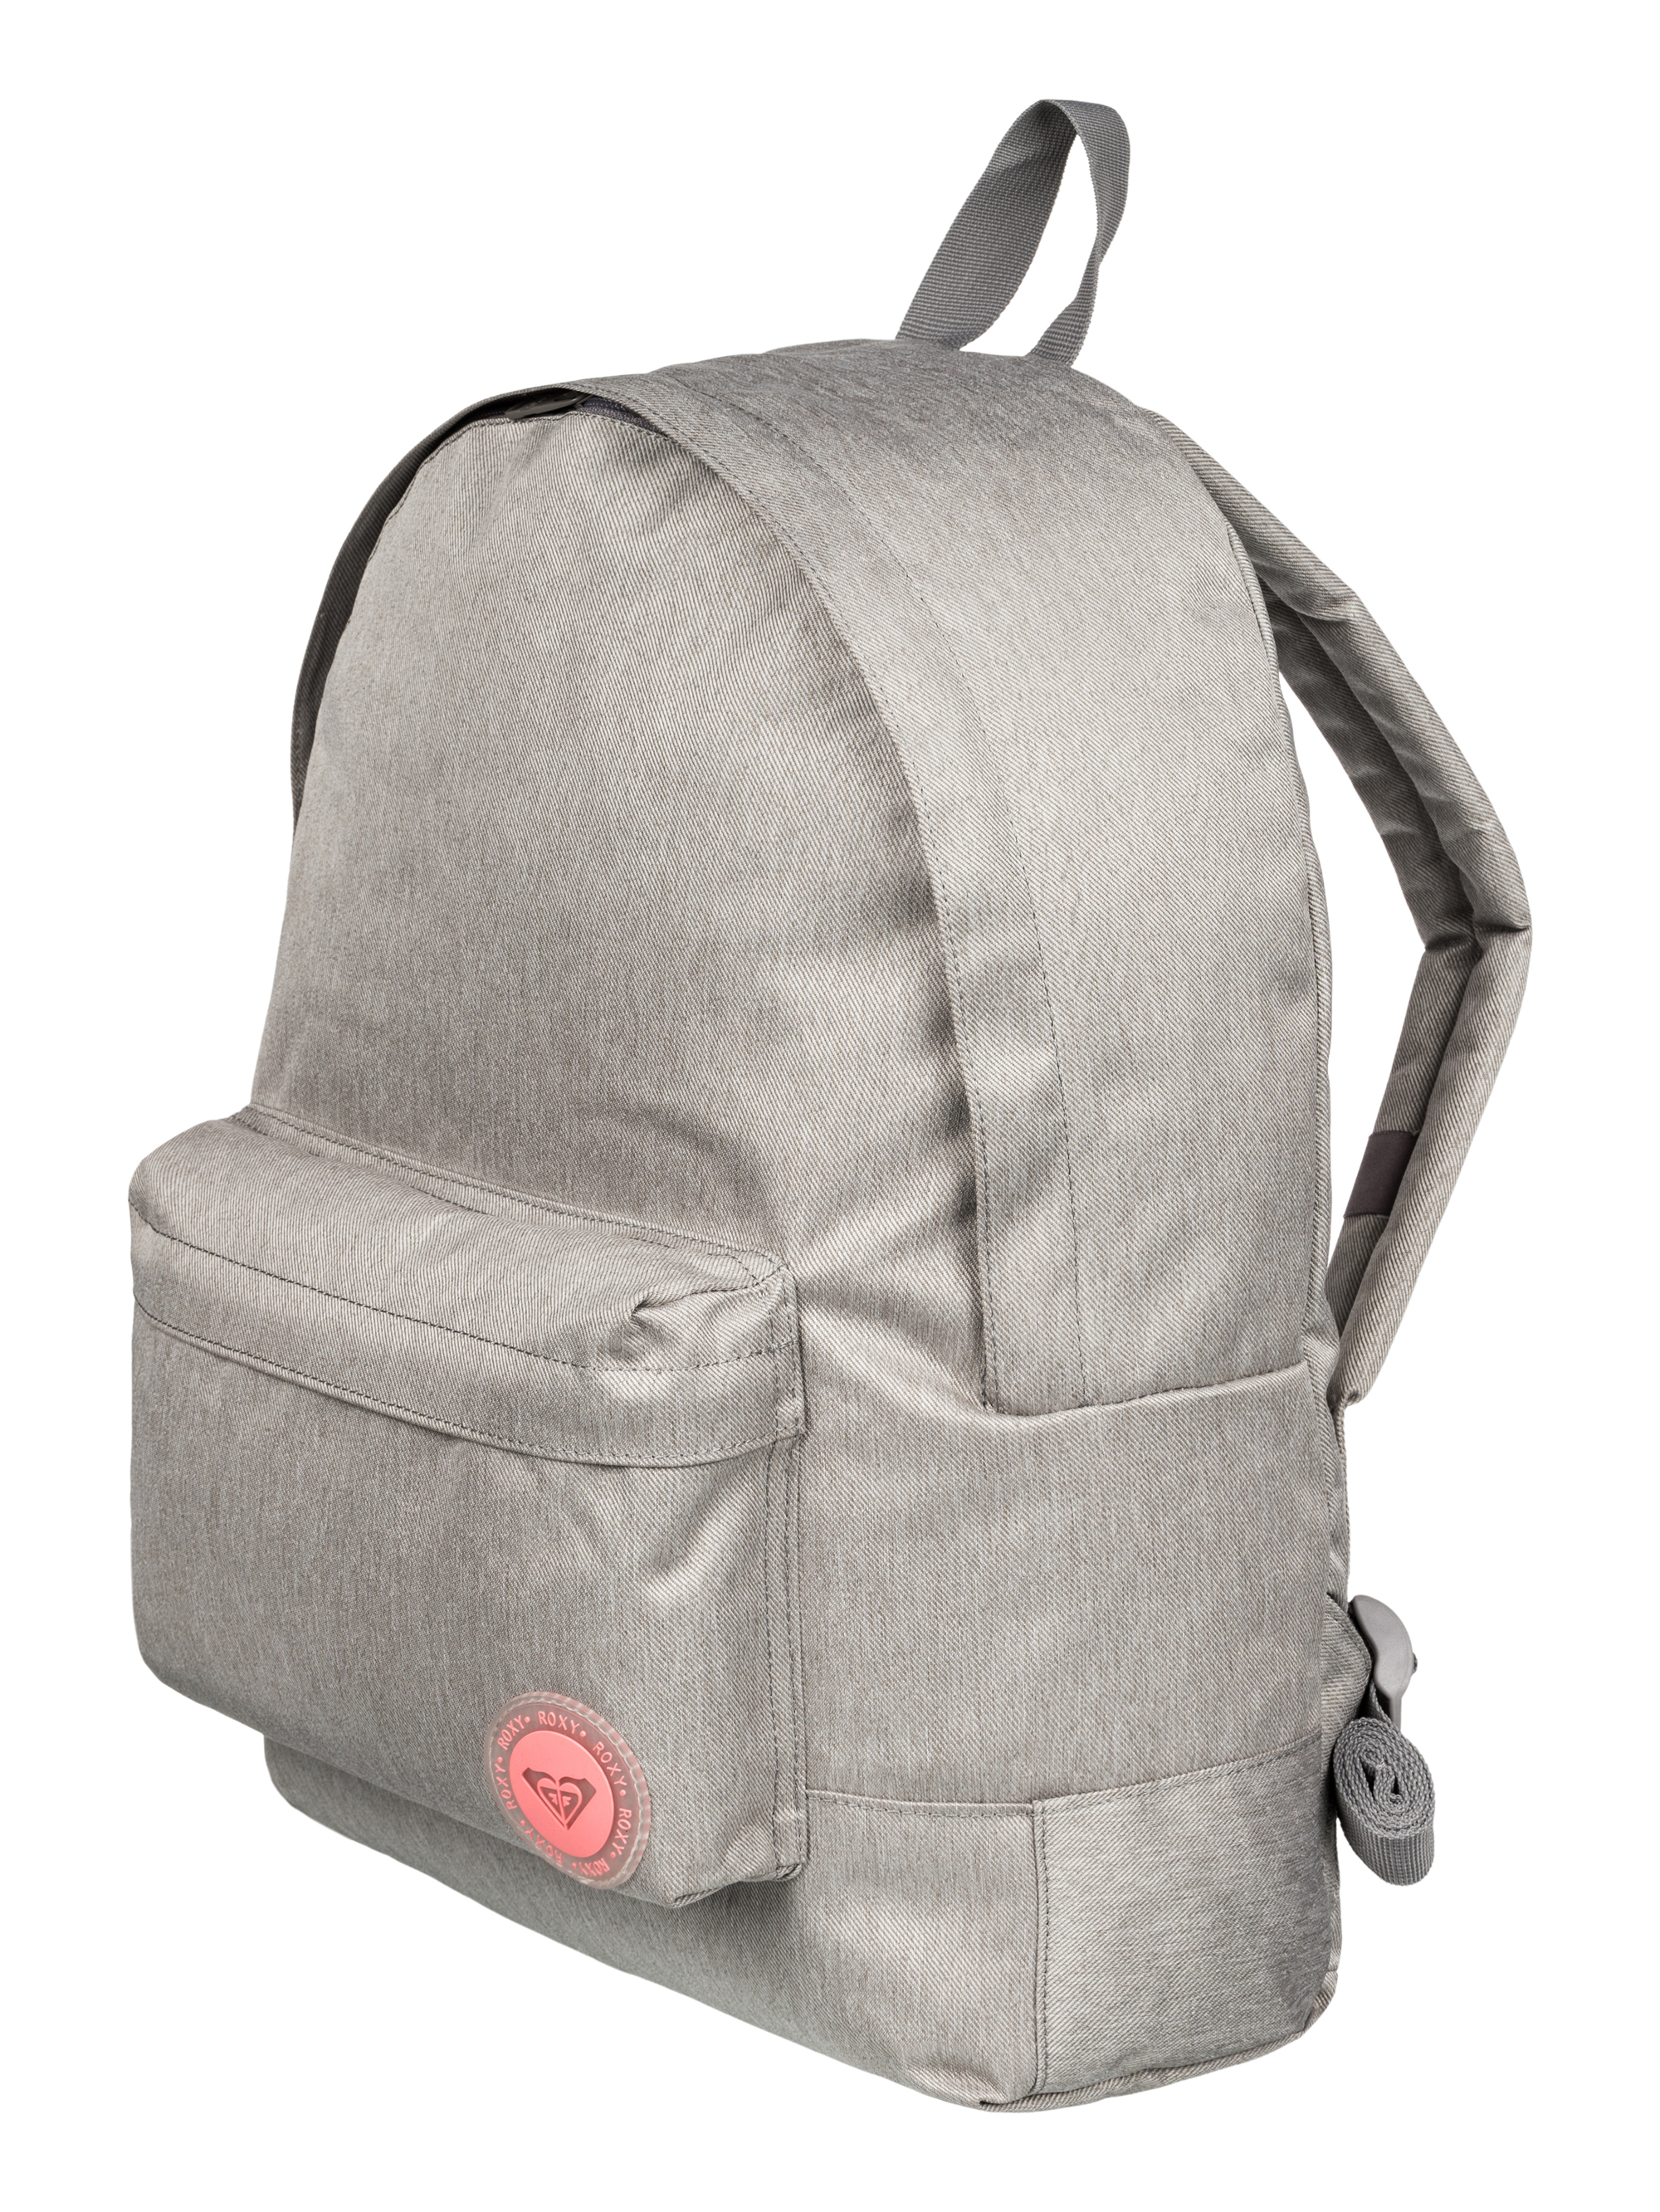 Roxy Women/'s Sugar Baby Travel School Gym Backpack ERJBP03063 KVJ8 RRP-£25